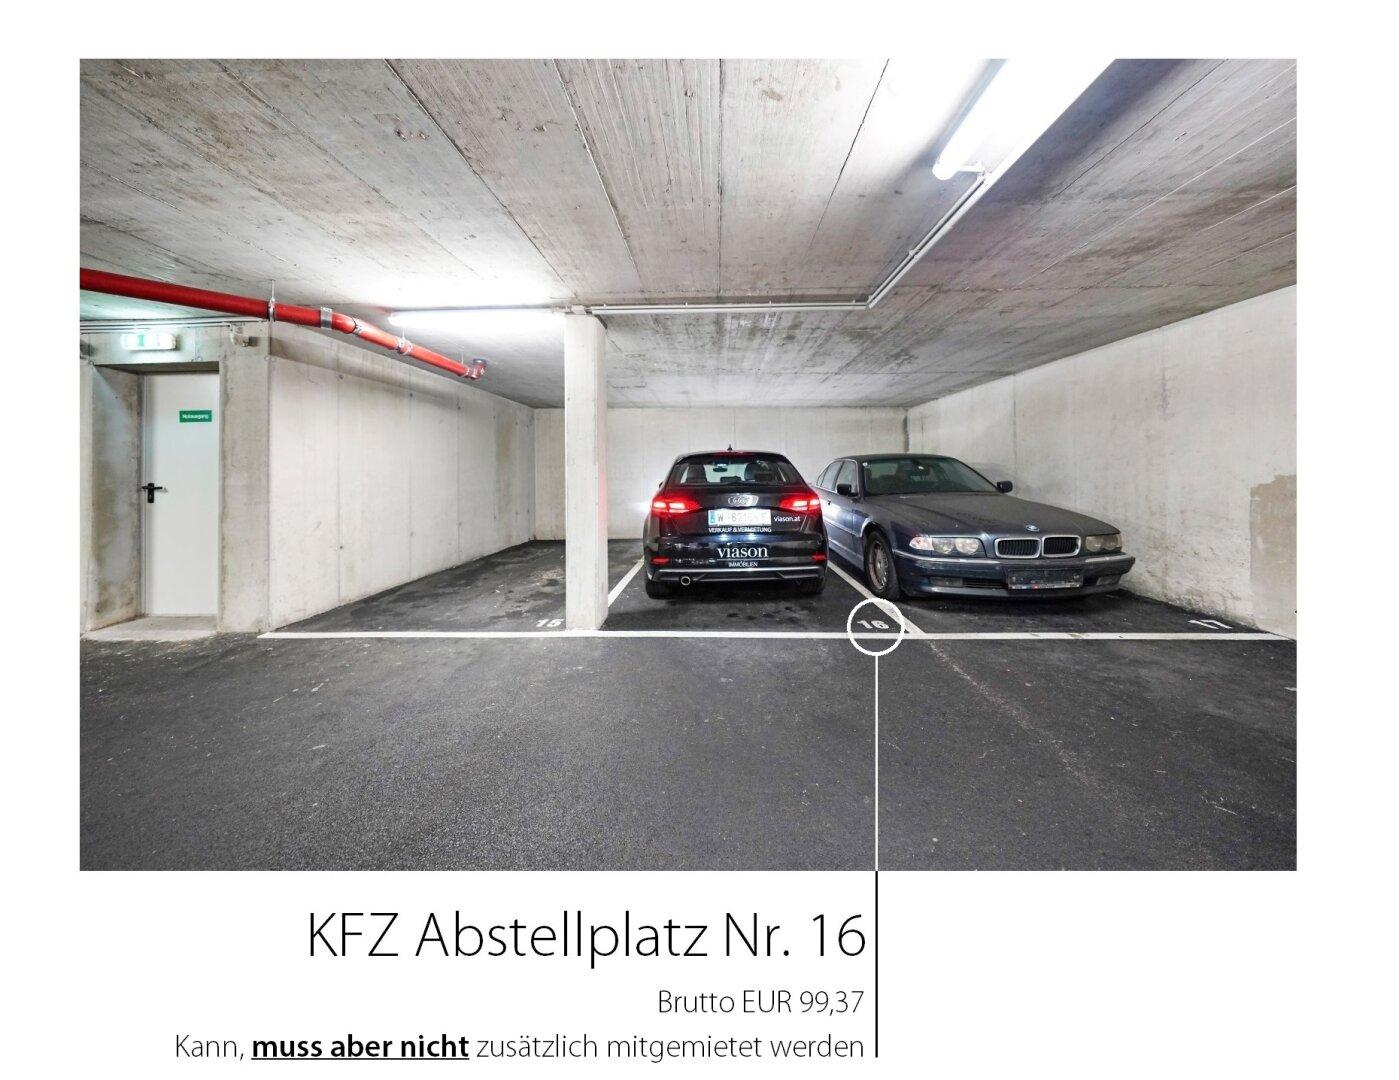 KFZ - Abstellplatz Nr. 16